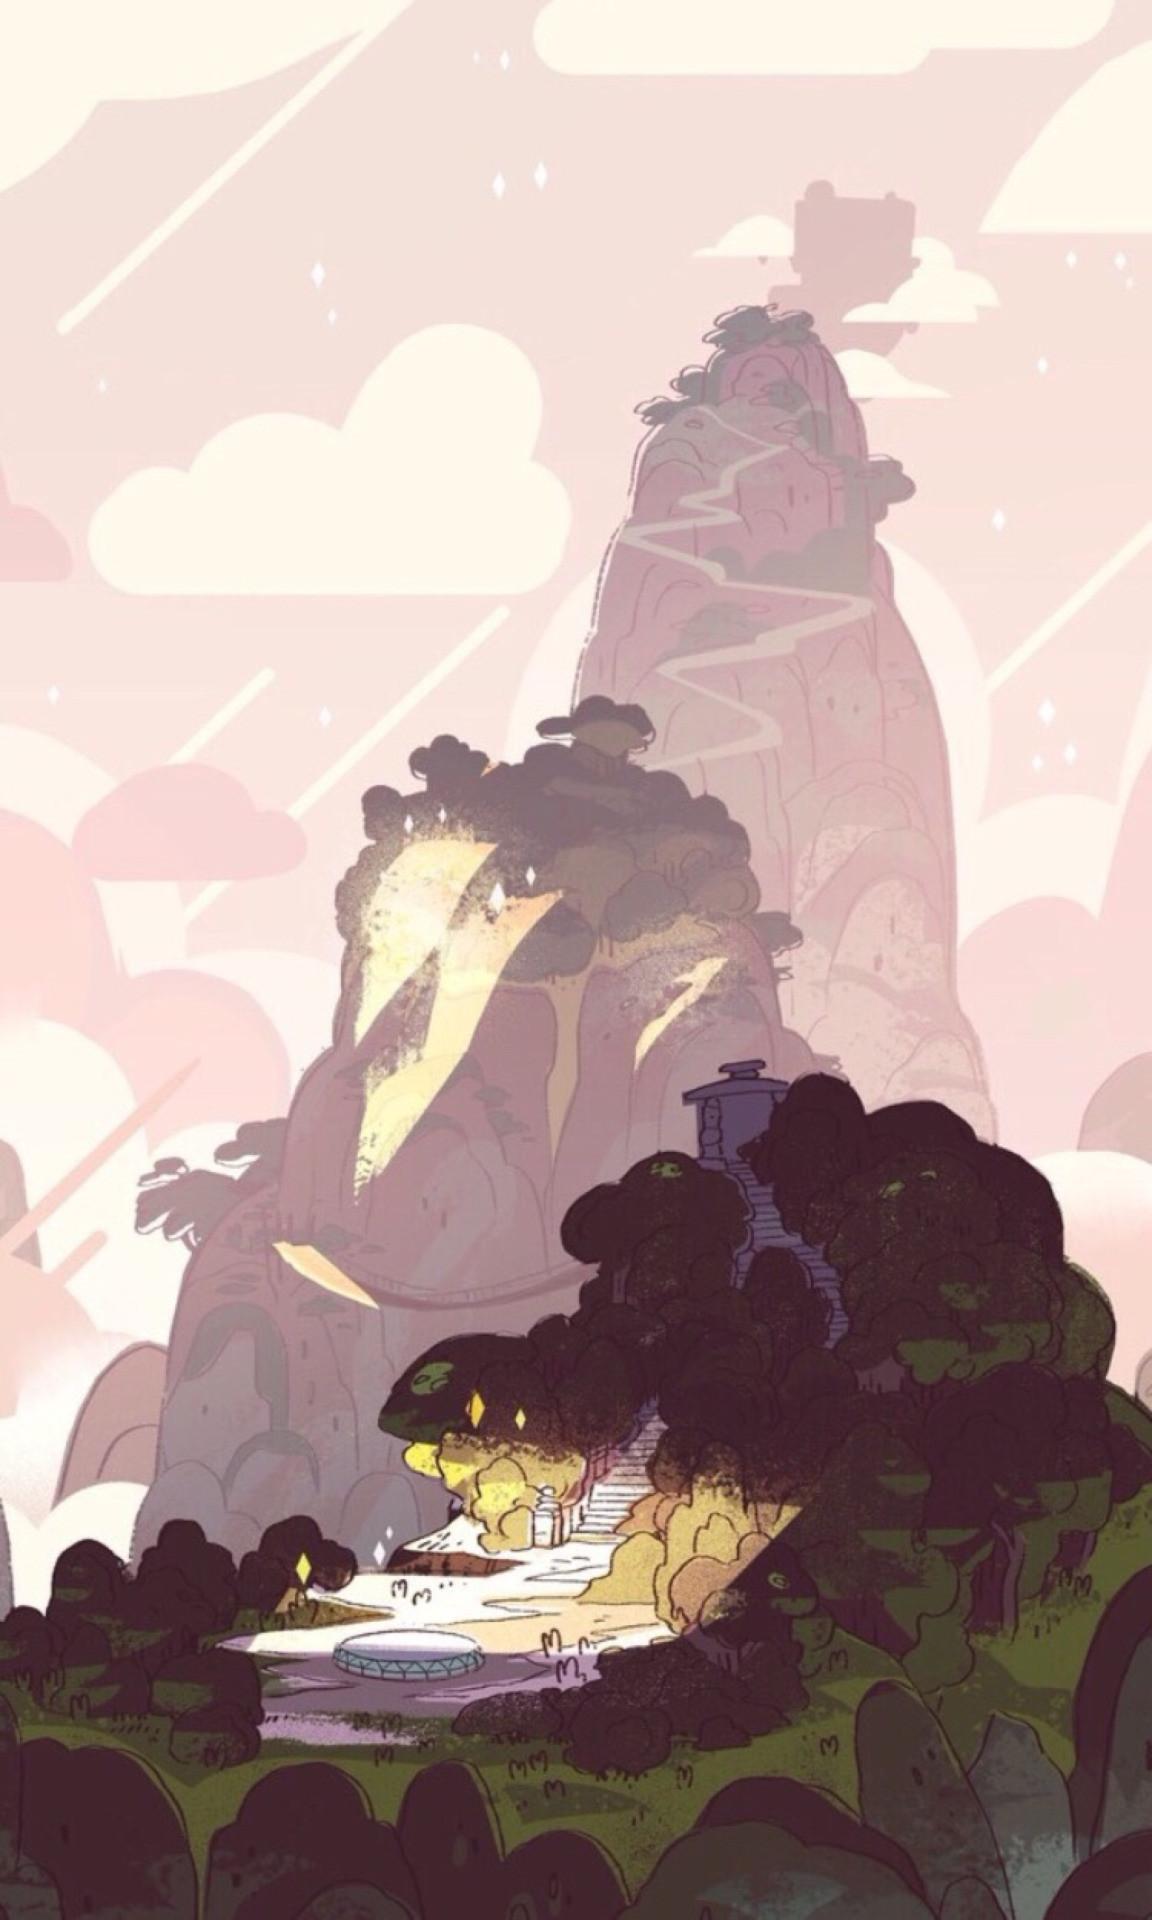 1152x1920 Cartoon Network Pink Backgrounds SU Aesthetic Phone Wallpaper Rebecca Sugar Steven Universe IPhone